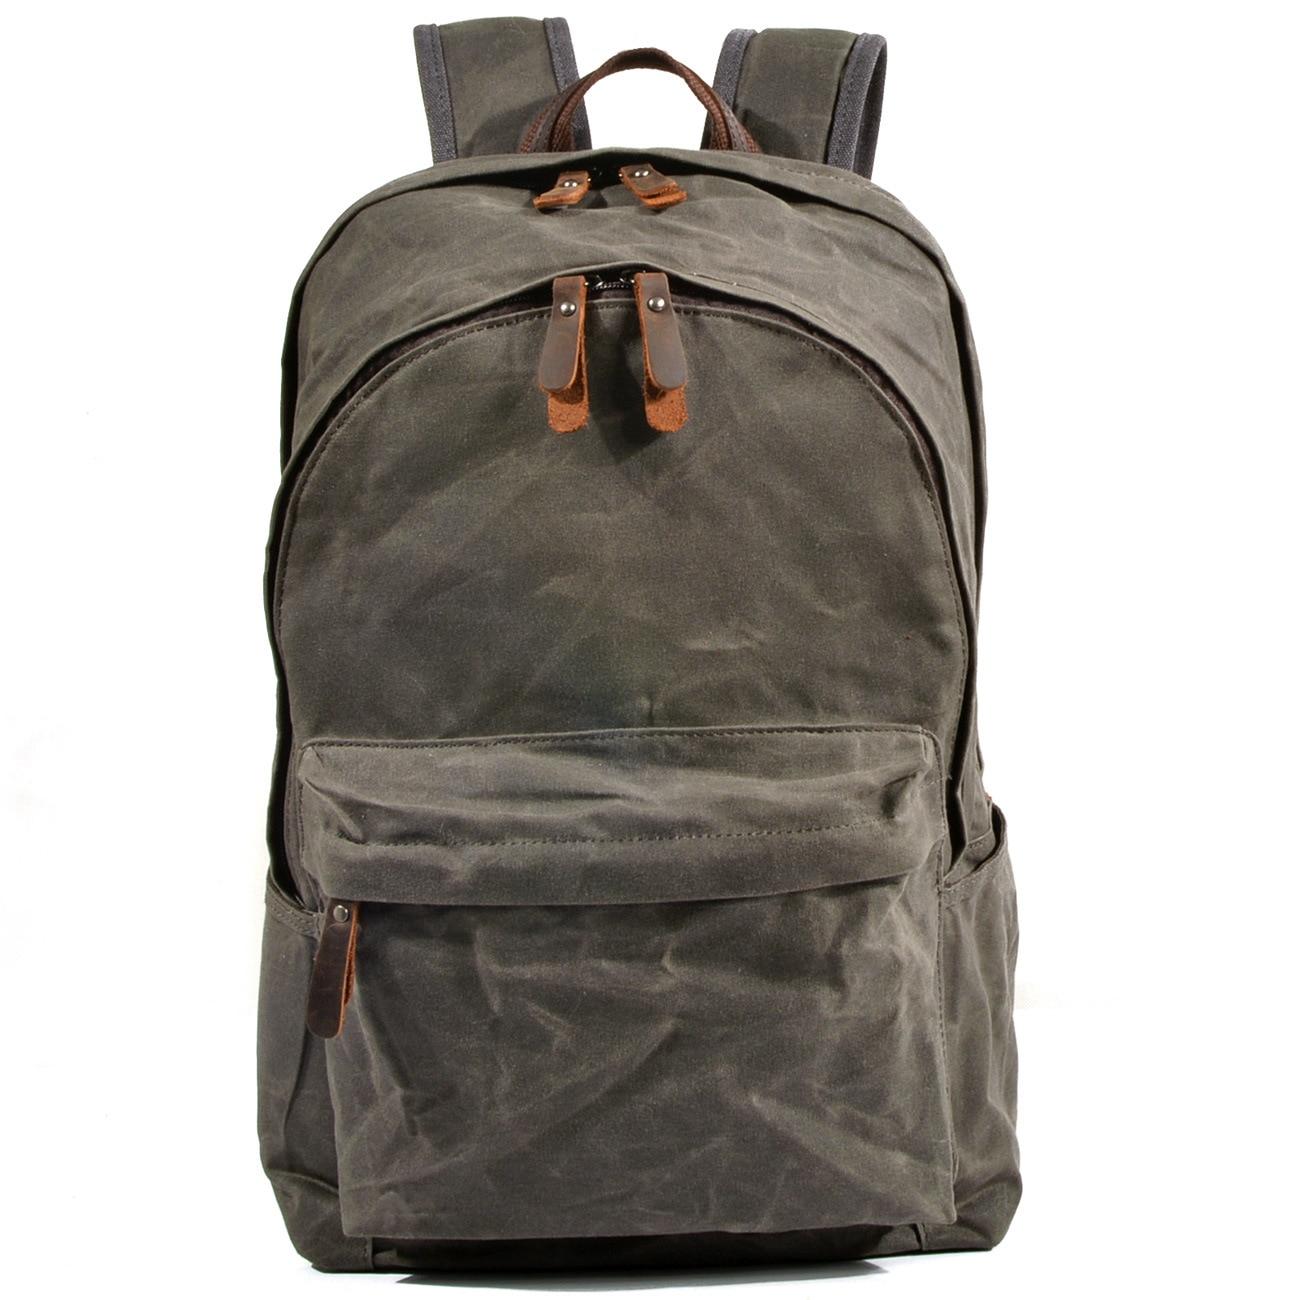 New amasie England backpack book bag causal daily bag pack cotton canvas men backpack GET0009 цены